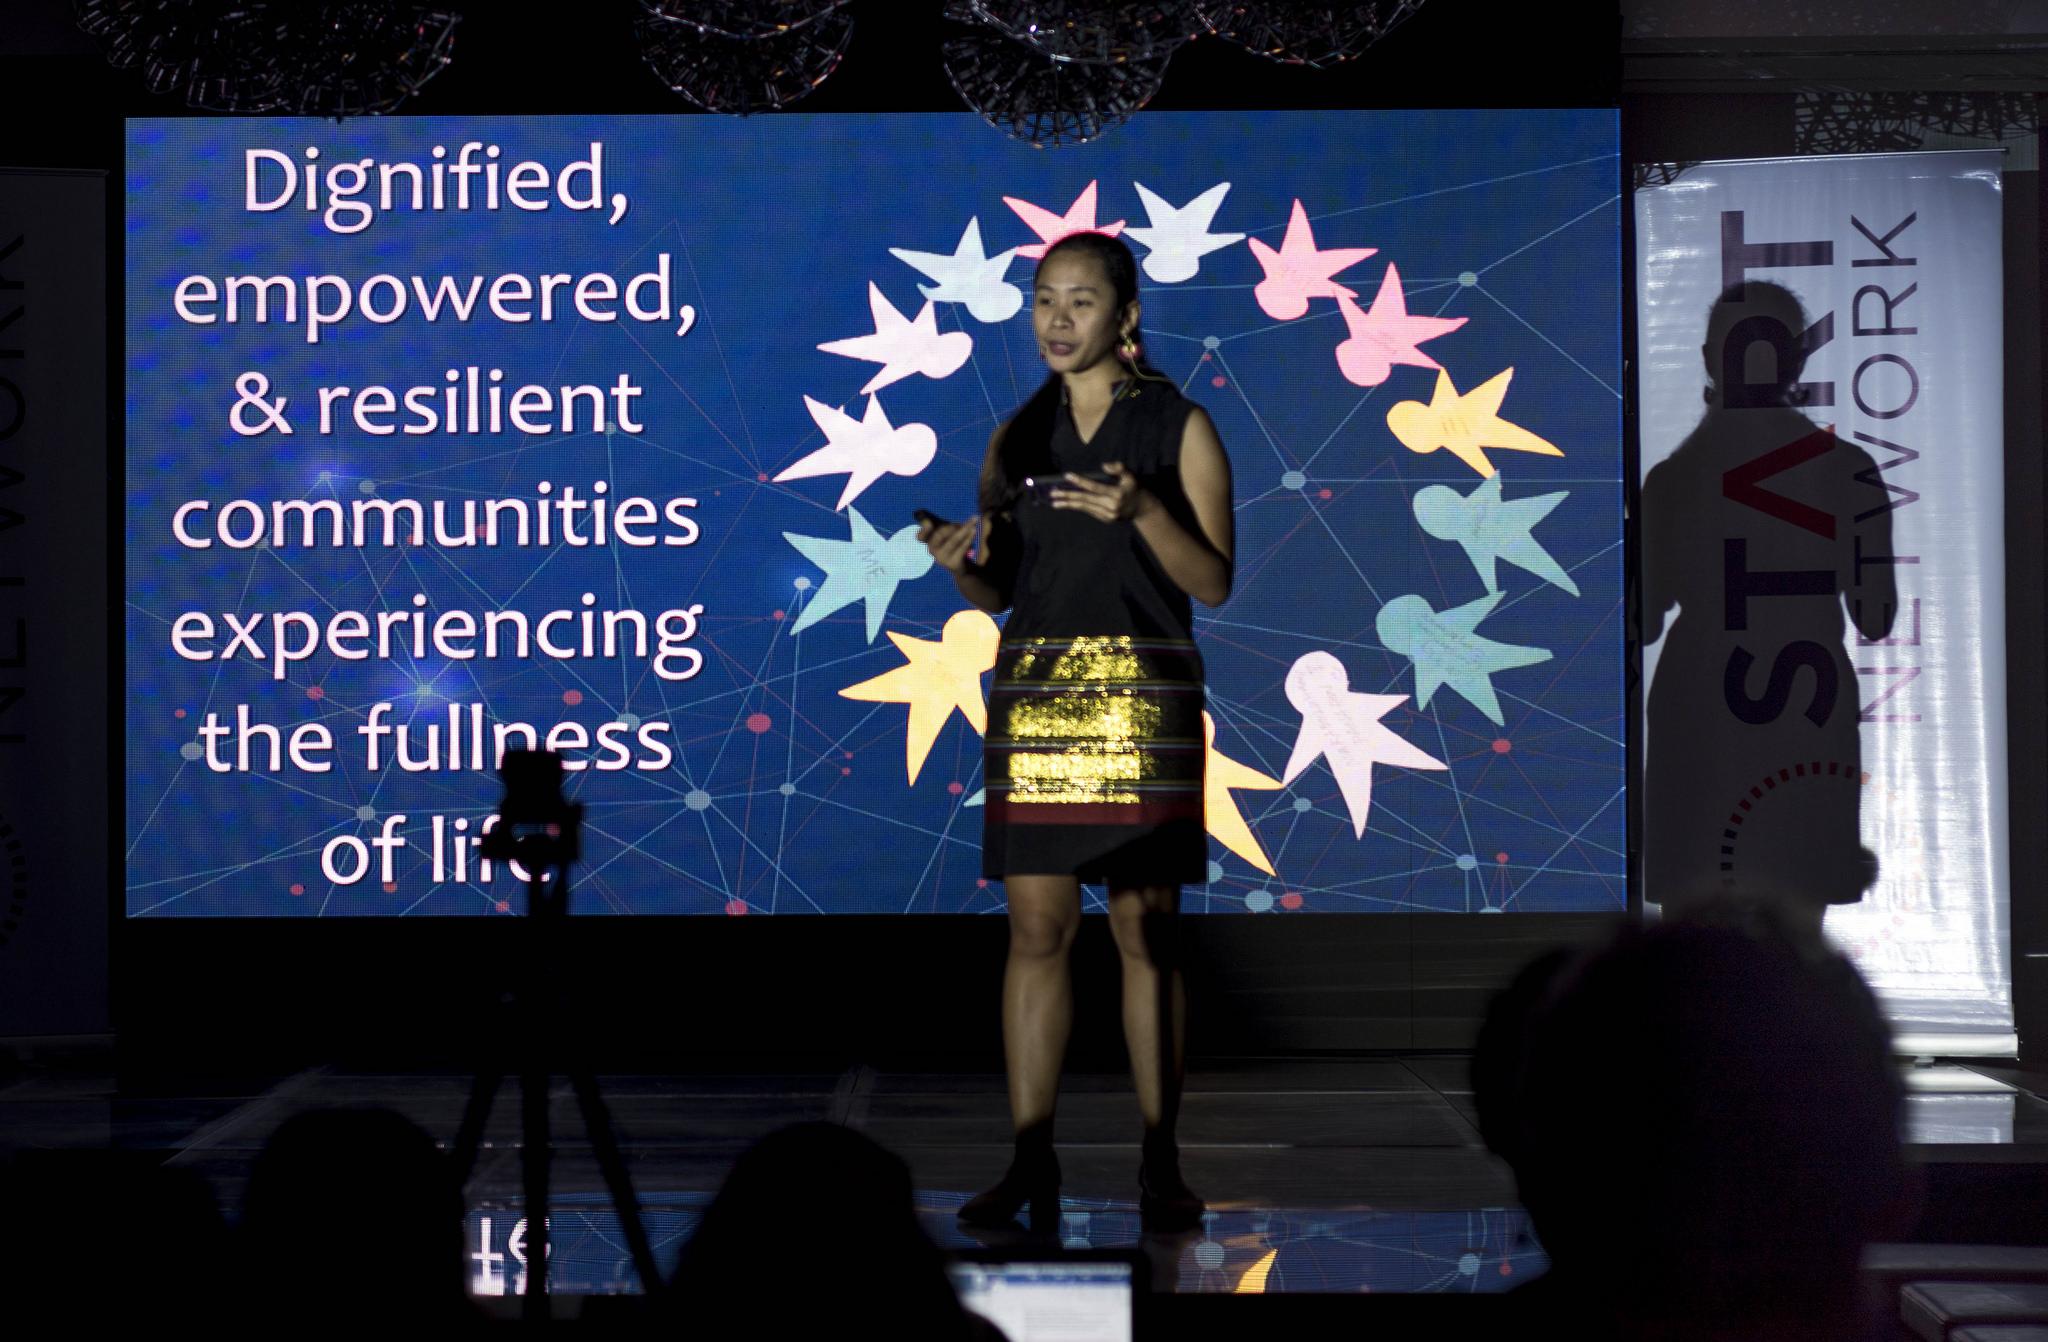 (Photo credit: Christian Aid Philippines)